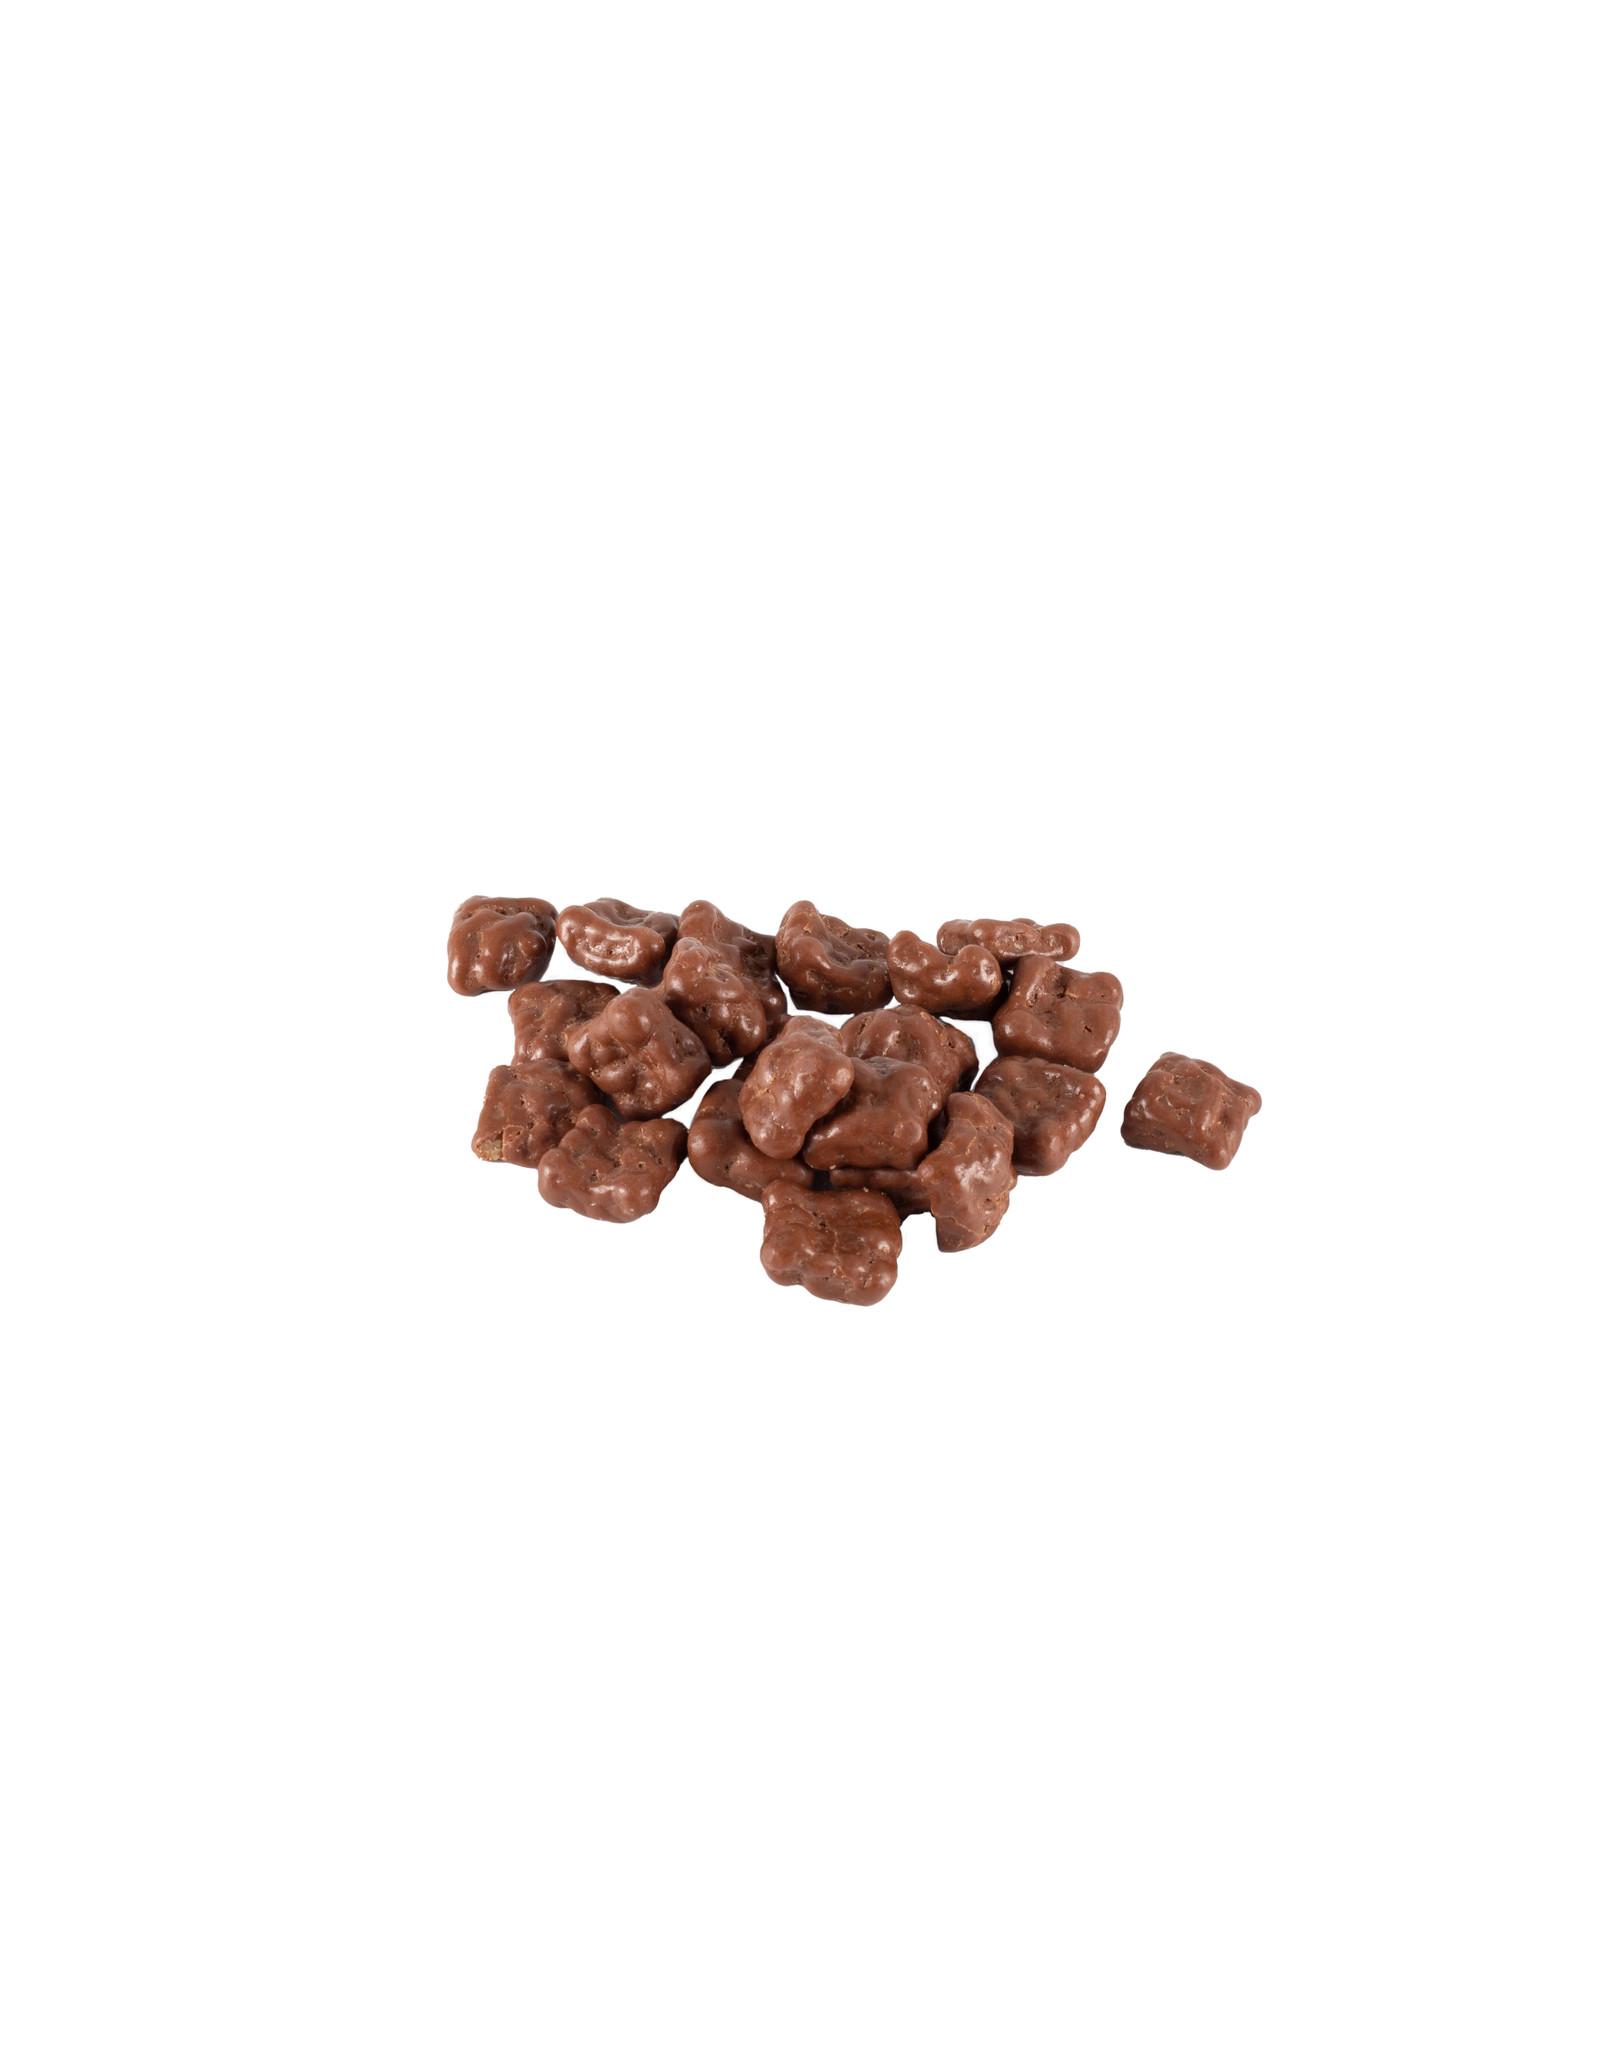 Max & Alex Max & Alex - Stroopwafelstukjes Melk Chocolade - 32x 300 gram zakje (omdoos)